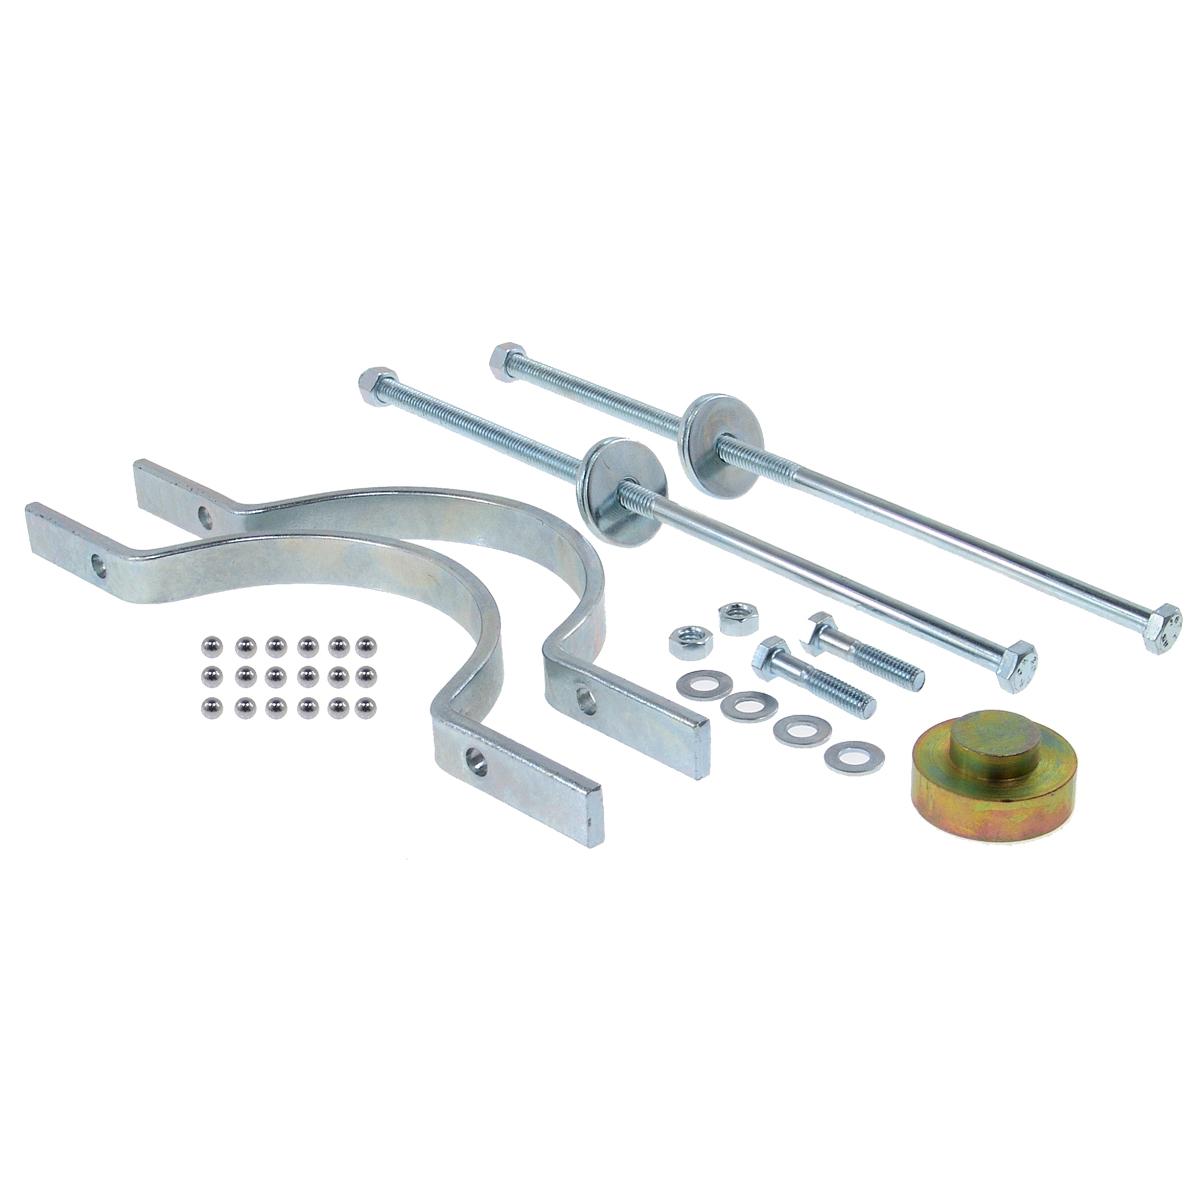 jatco cvt pulley tool